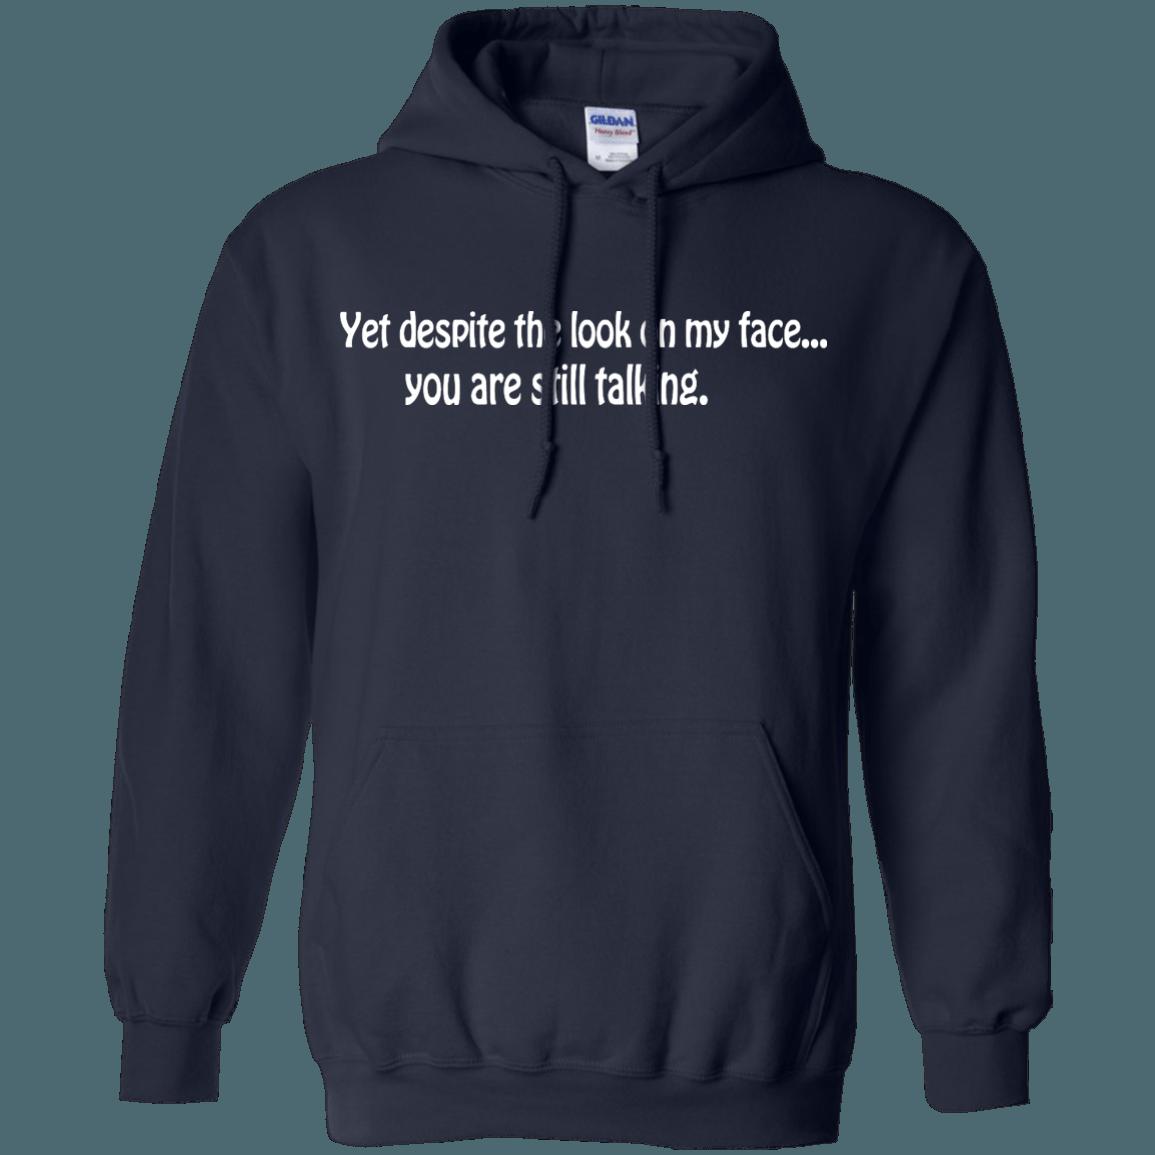 Despite The Look On My Face Mug T-Shirt - teepublic.com